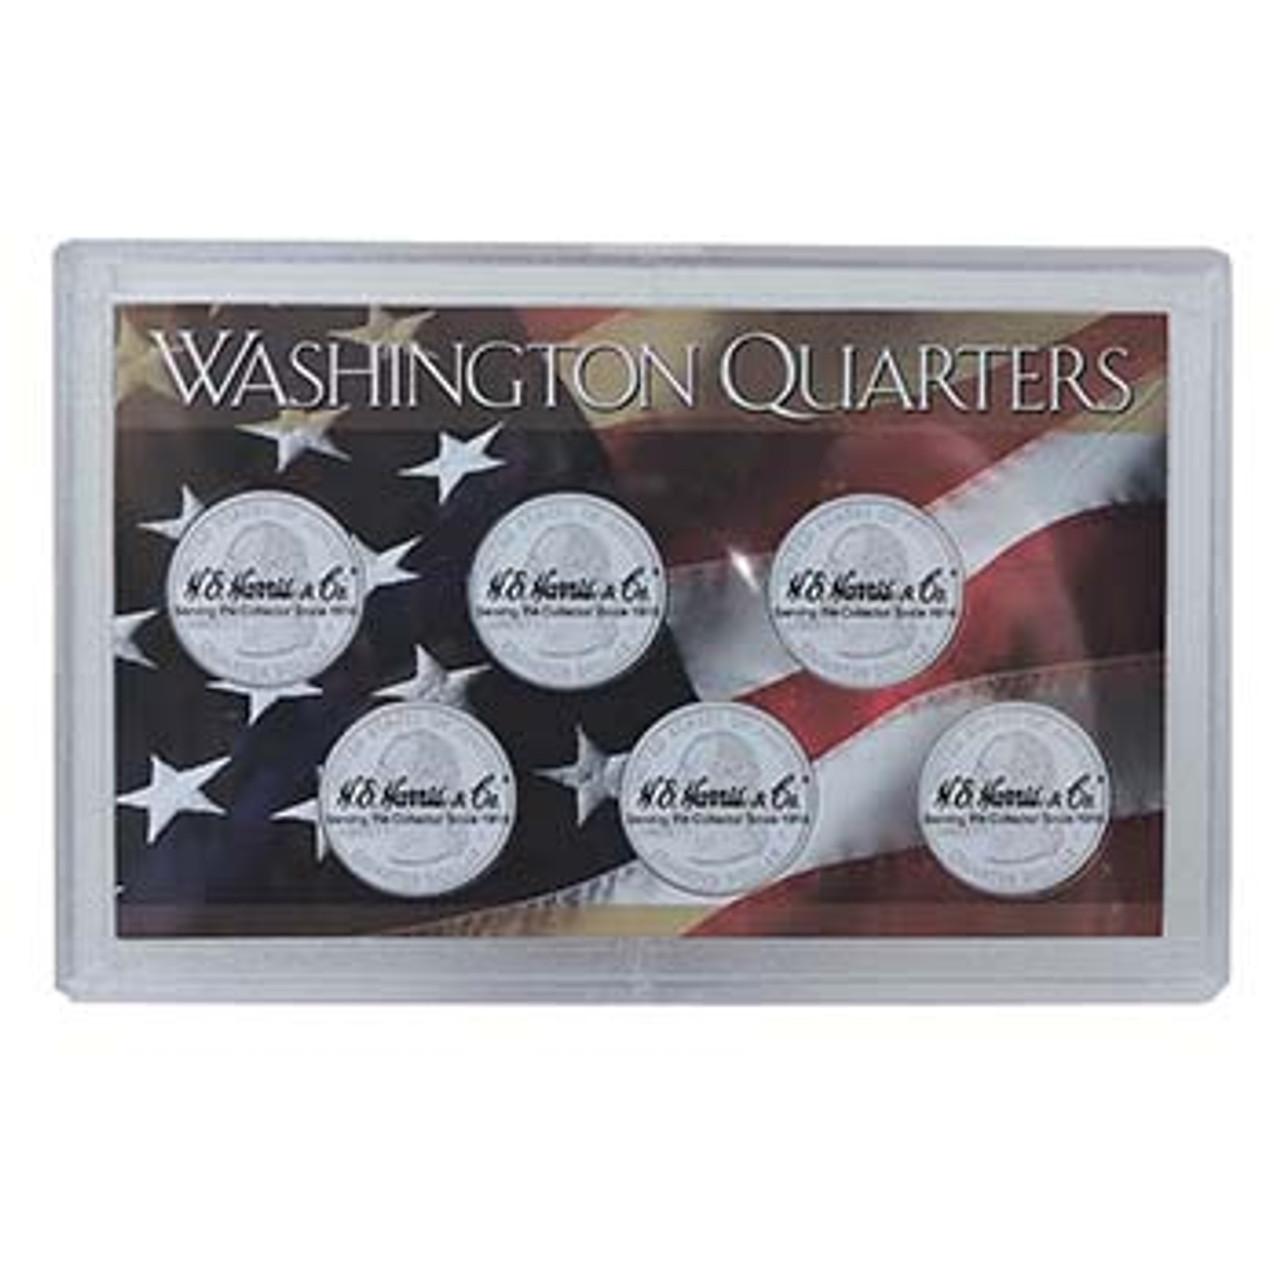 Harris Washington Quarter 6 Coin Case Image 1